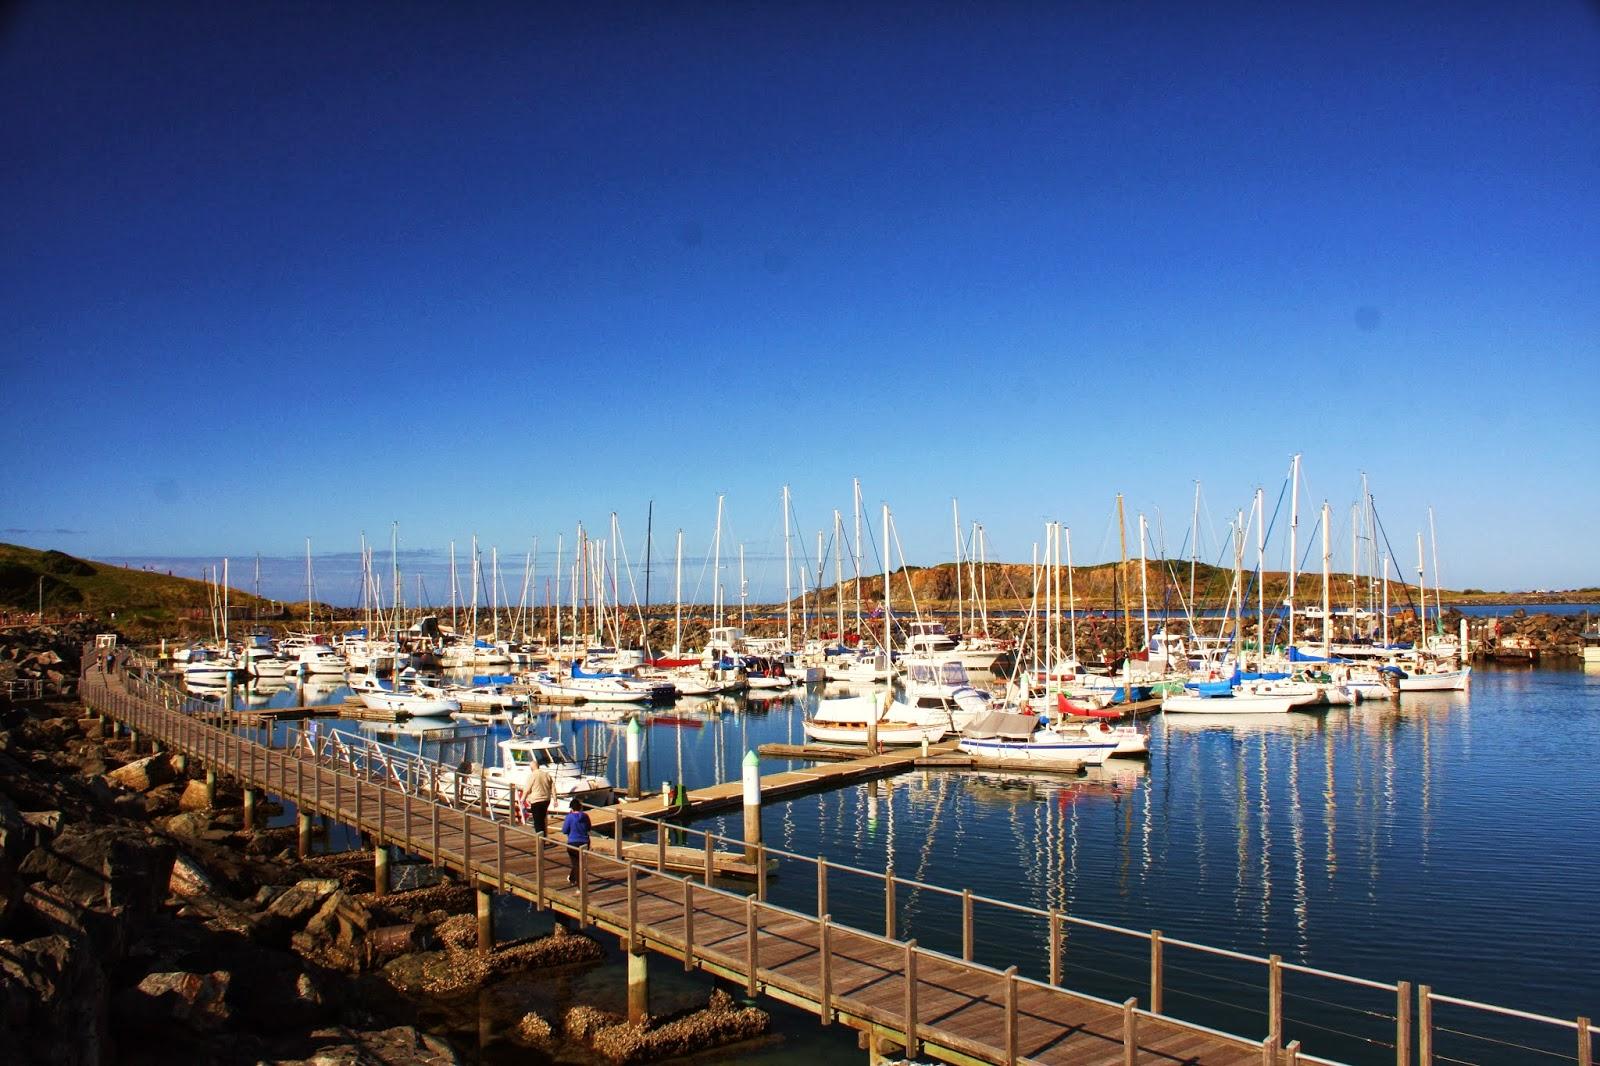 coffs harbour - photo #47